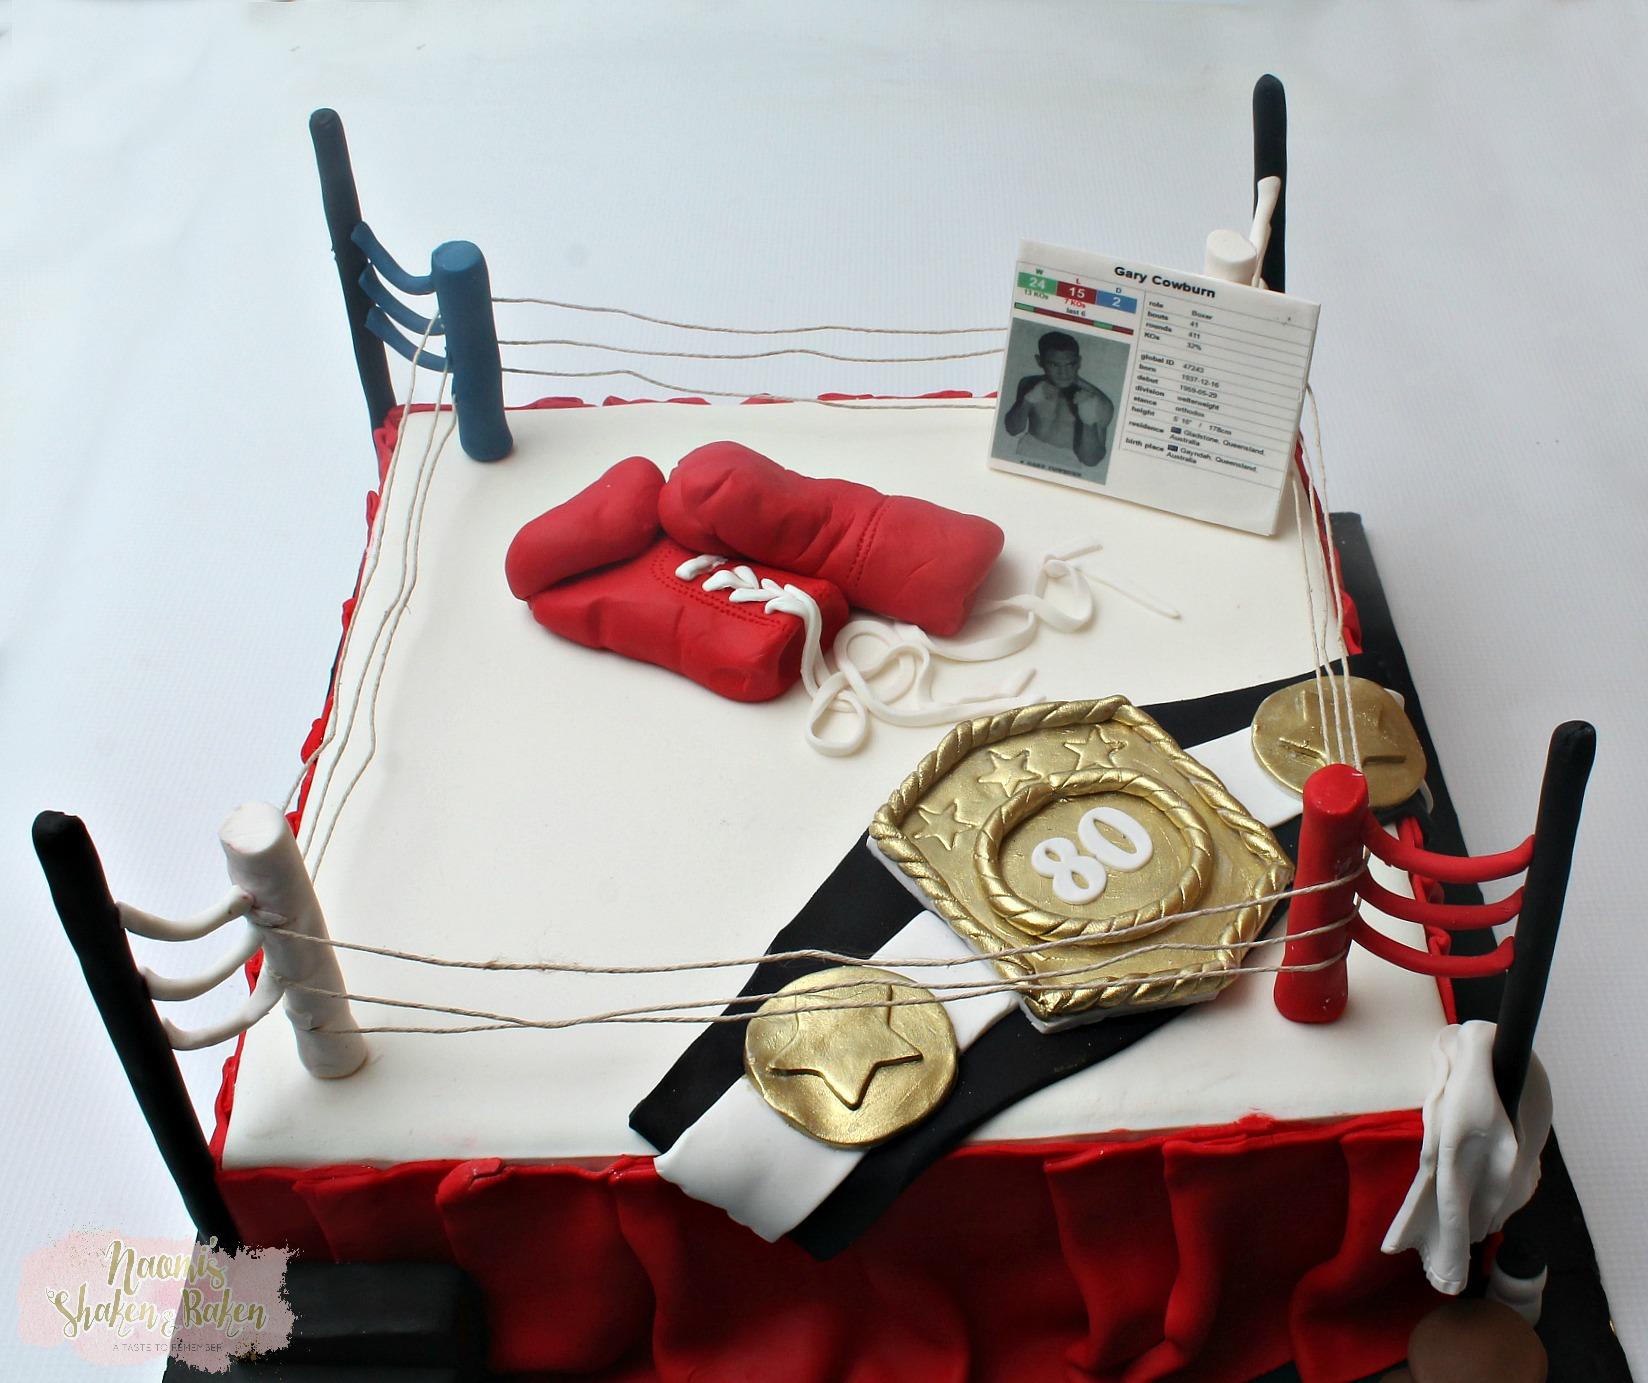 Gray Cowburn Boxing cake